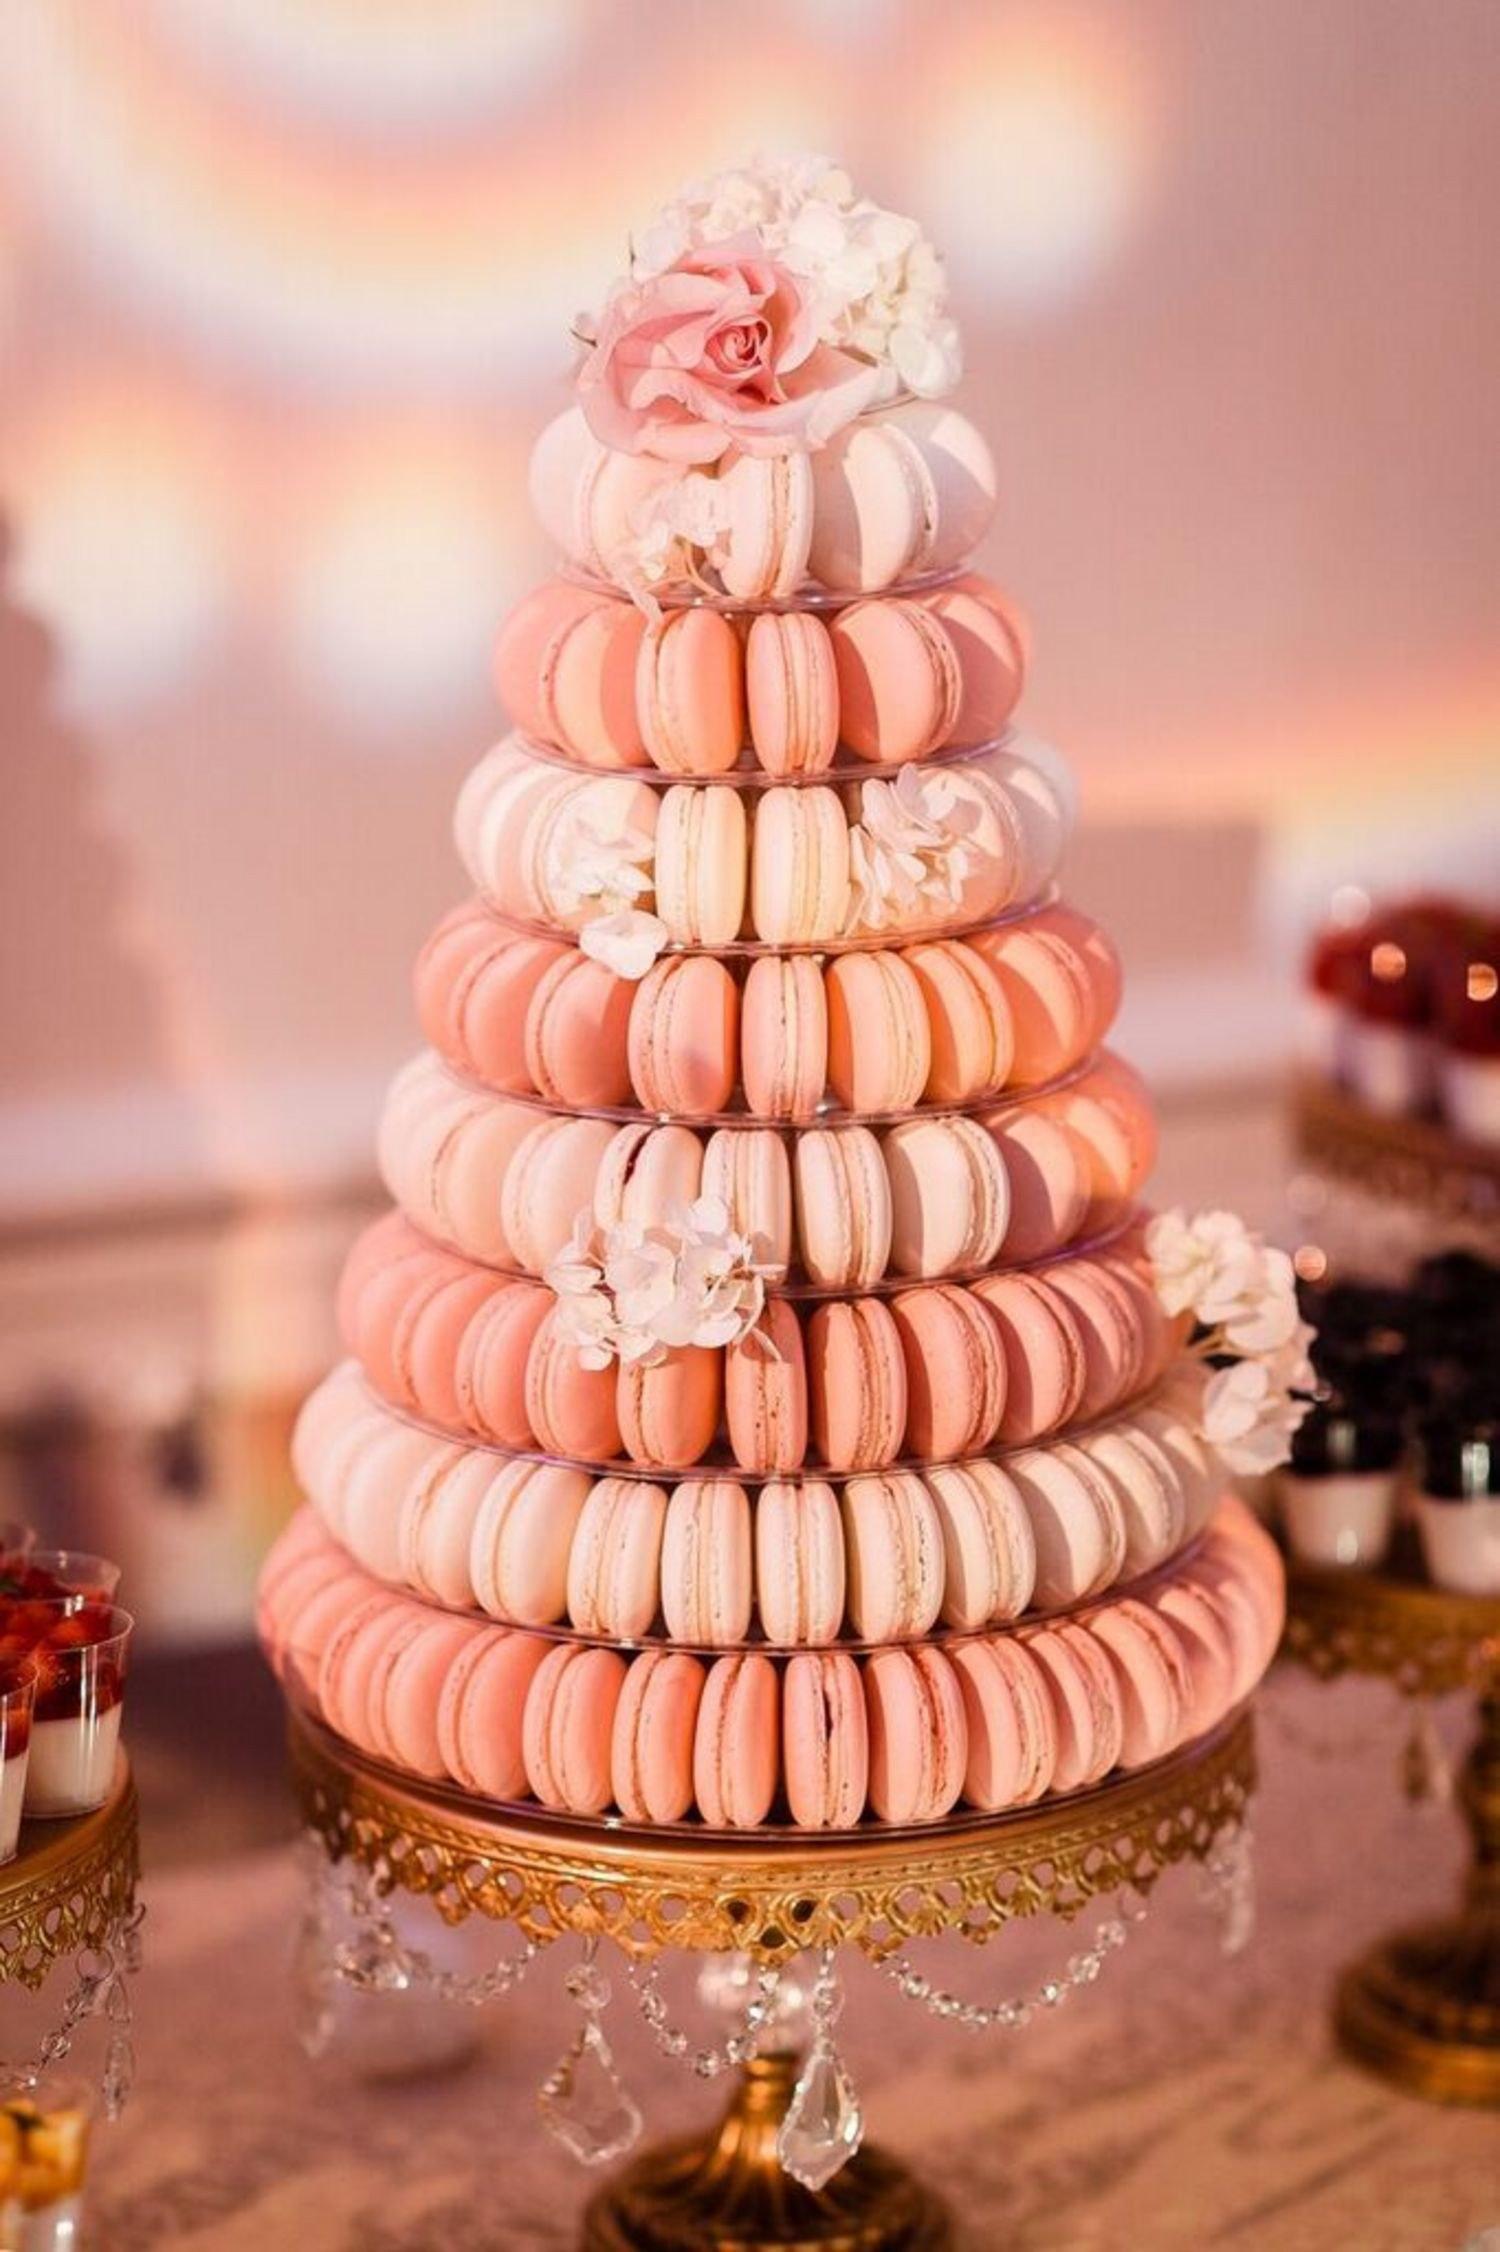 weddings macaron tower opulent treasures cake stand mp singh photography.jpg